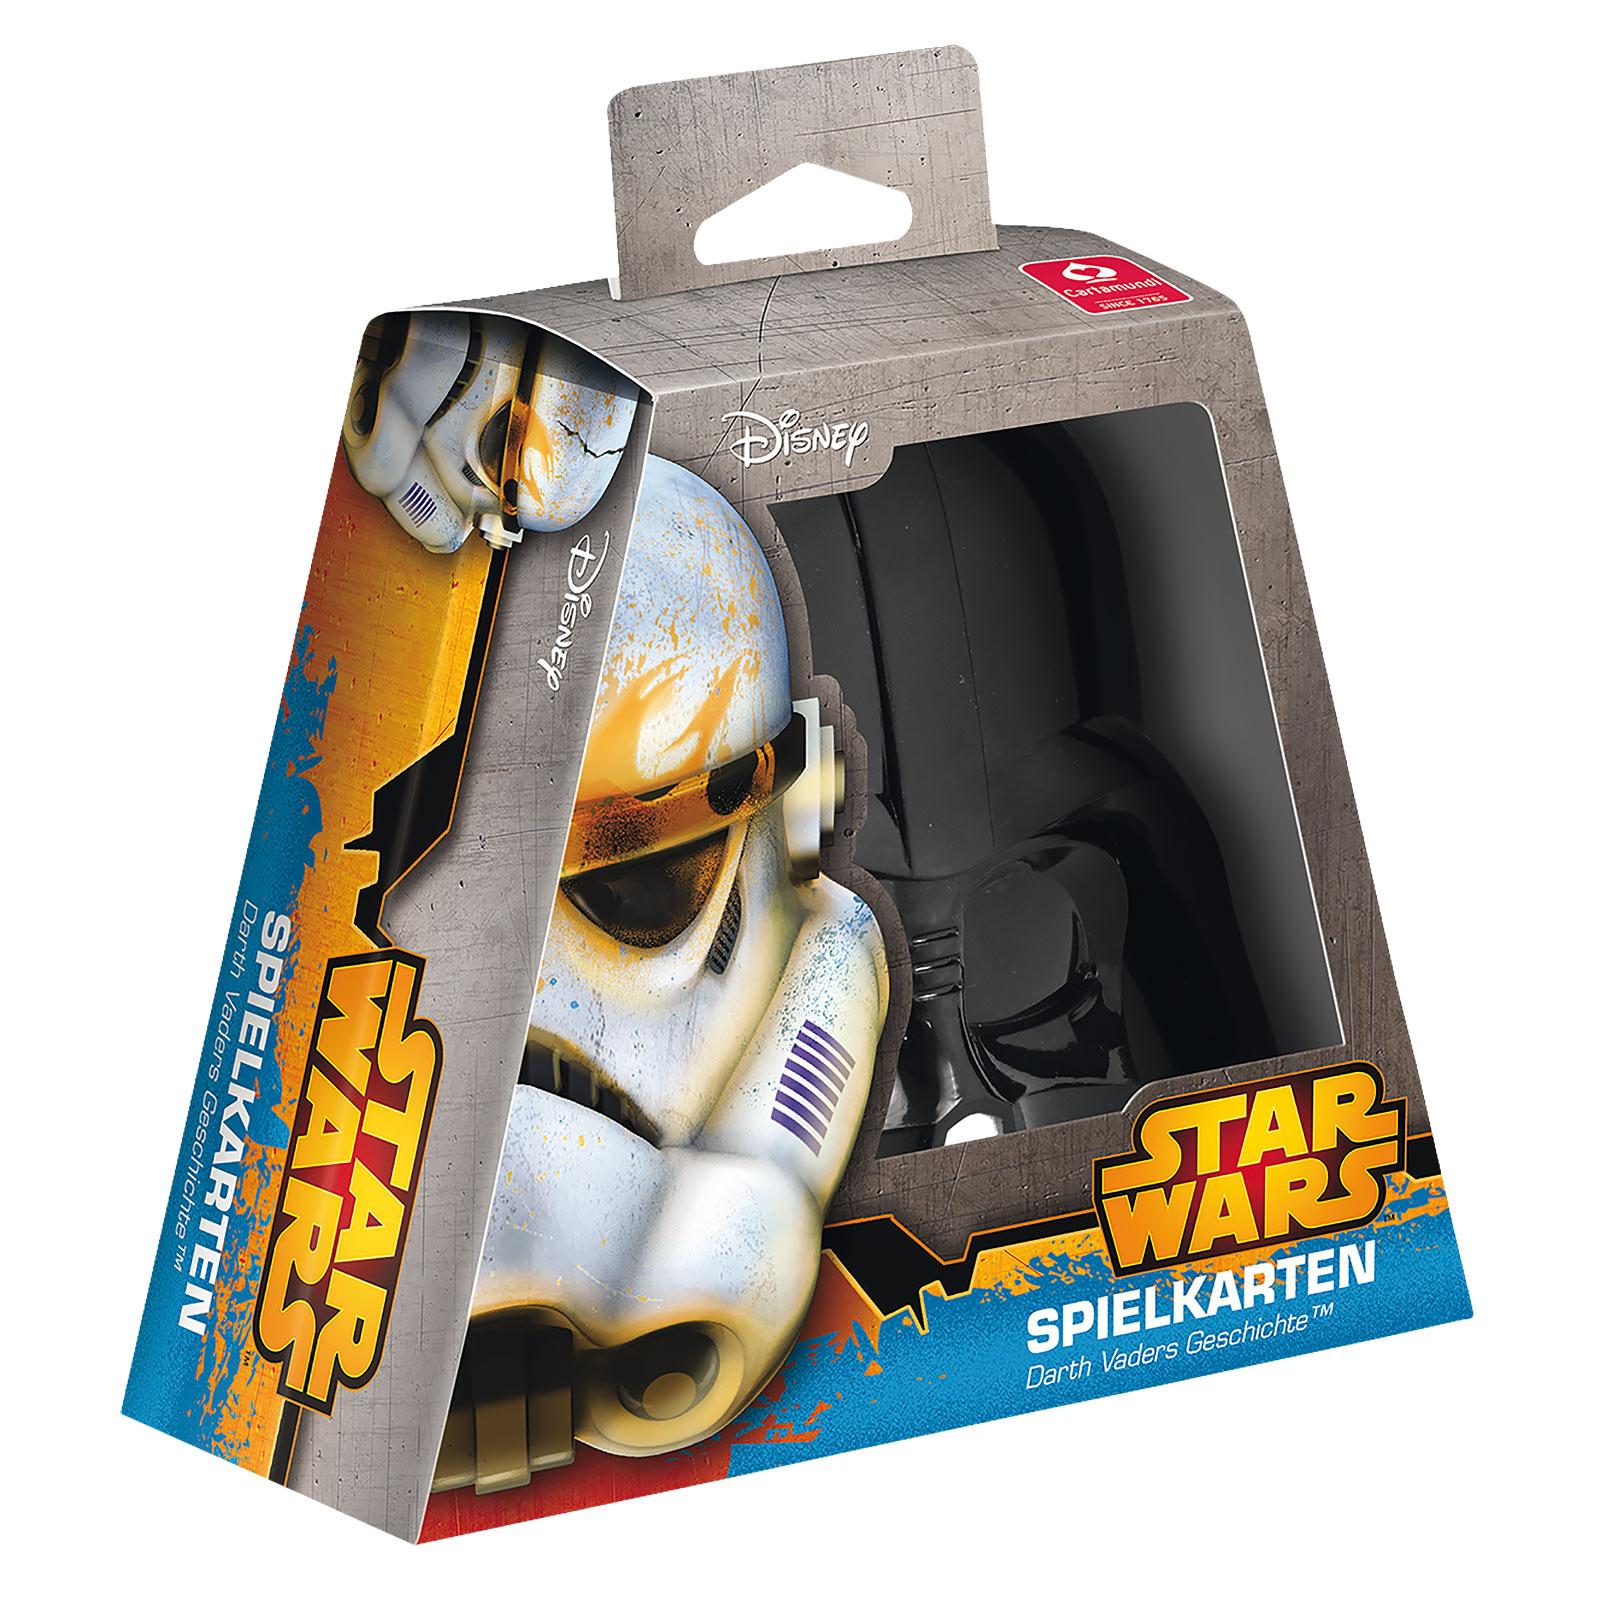 Star Wars - Darth Vader Spielkarten Fan-Edition